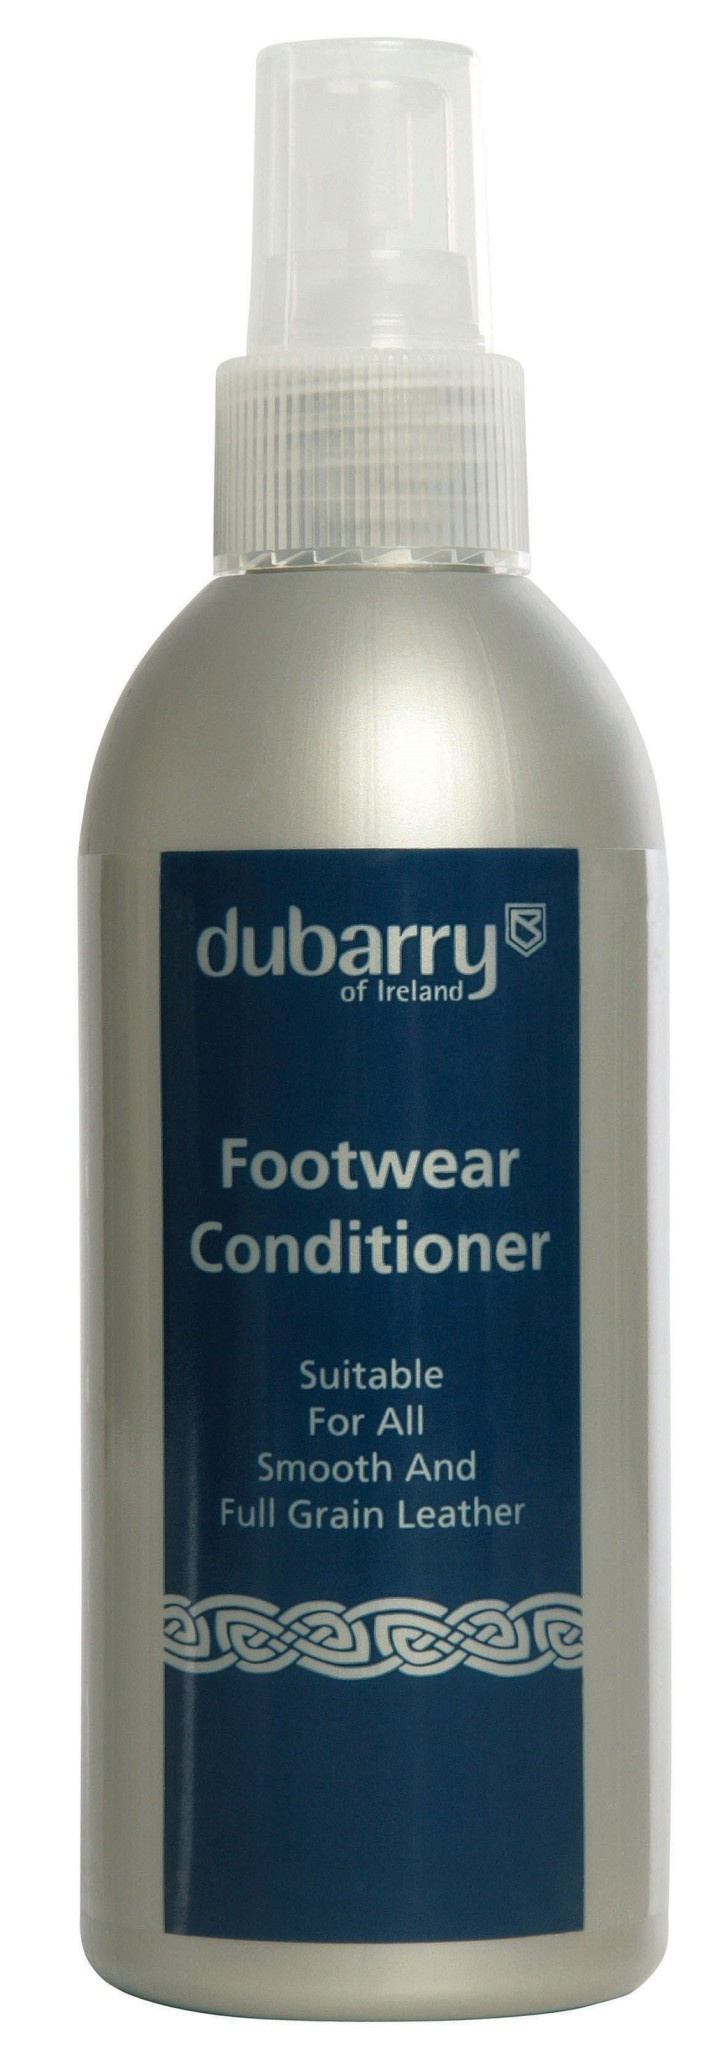 Dubarry Conditioner-1